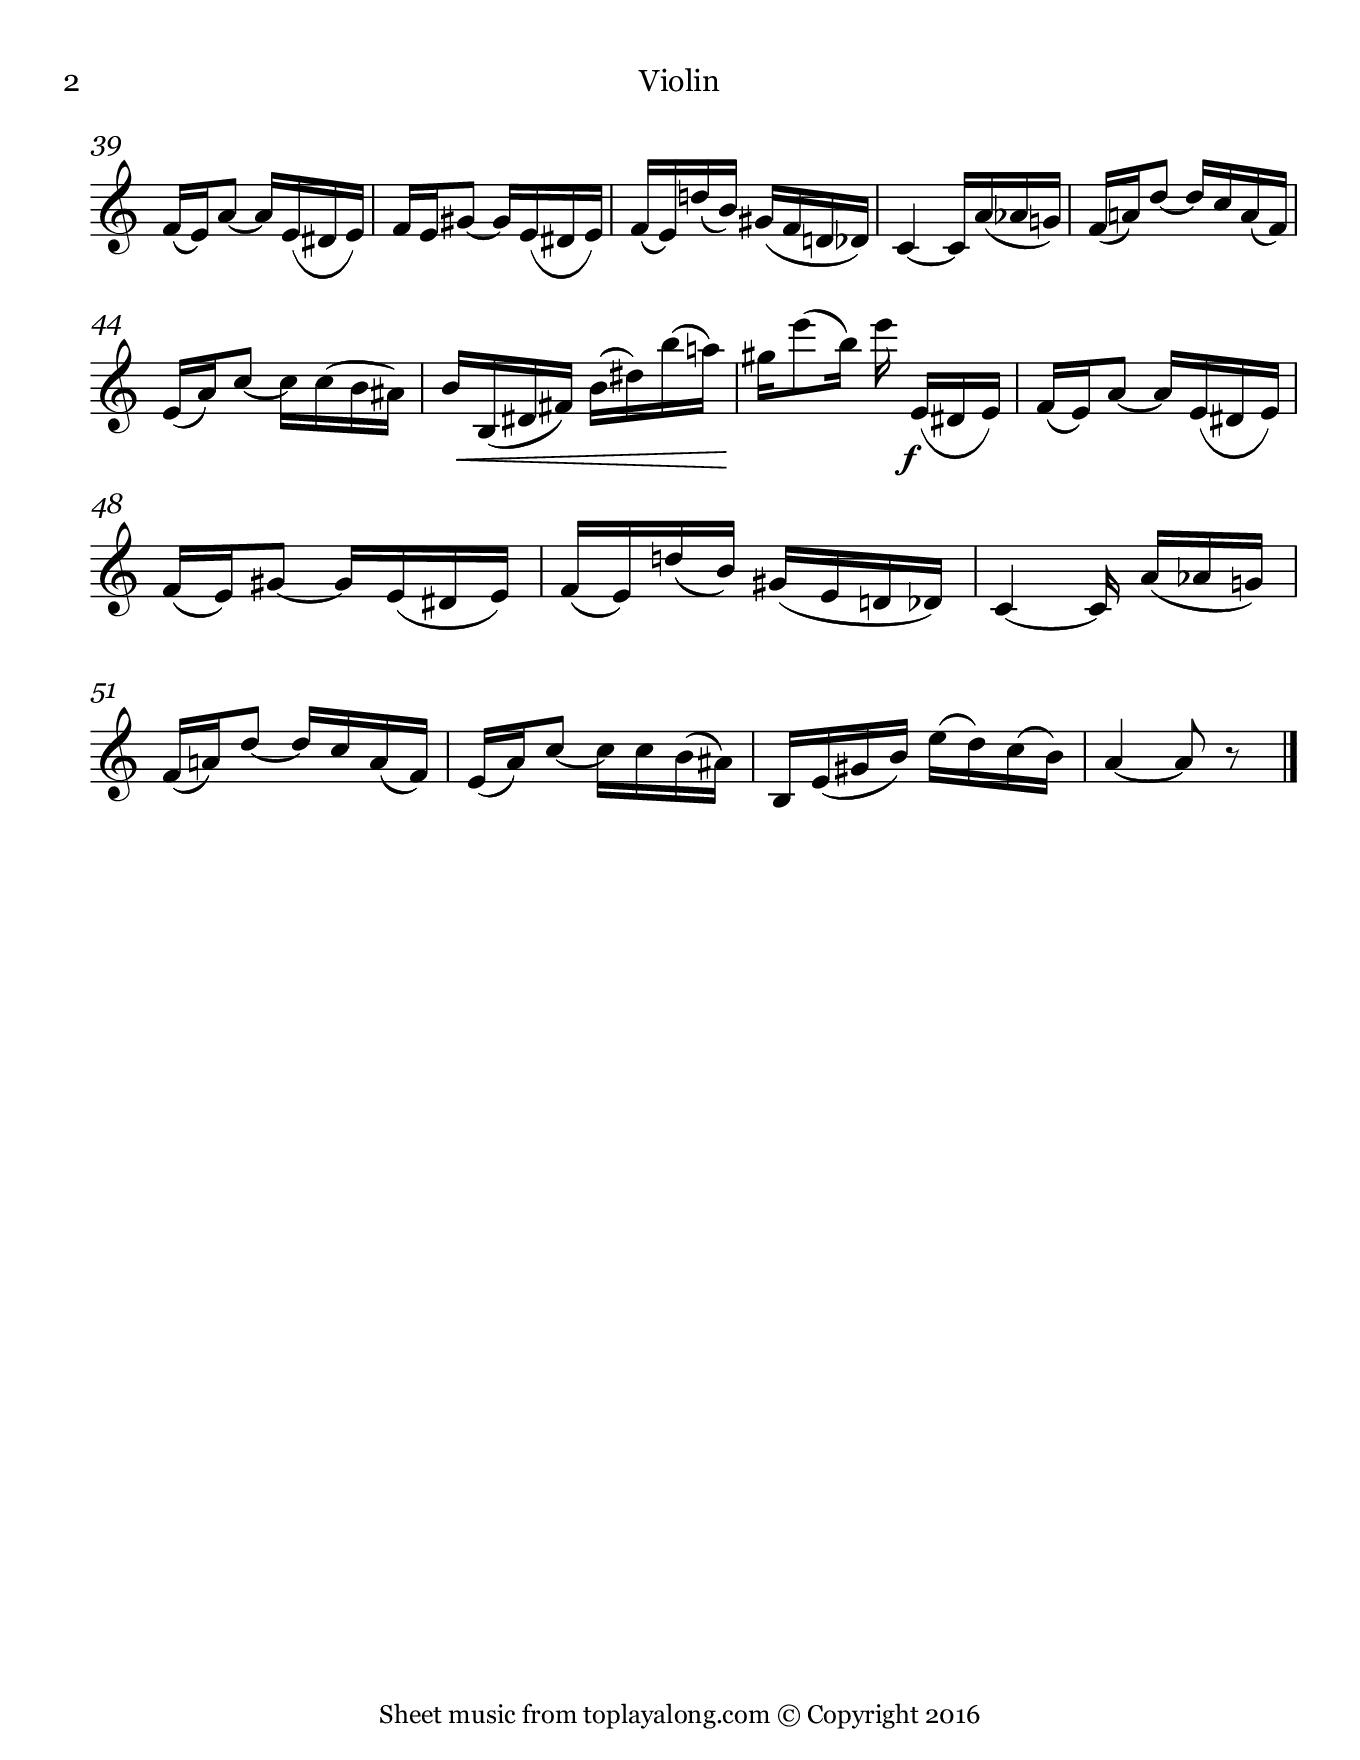 Tico-Tico no Fubá by Abreu. Sheet music for Violin, page 2.